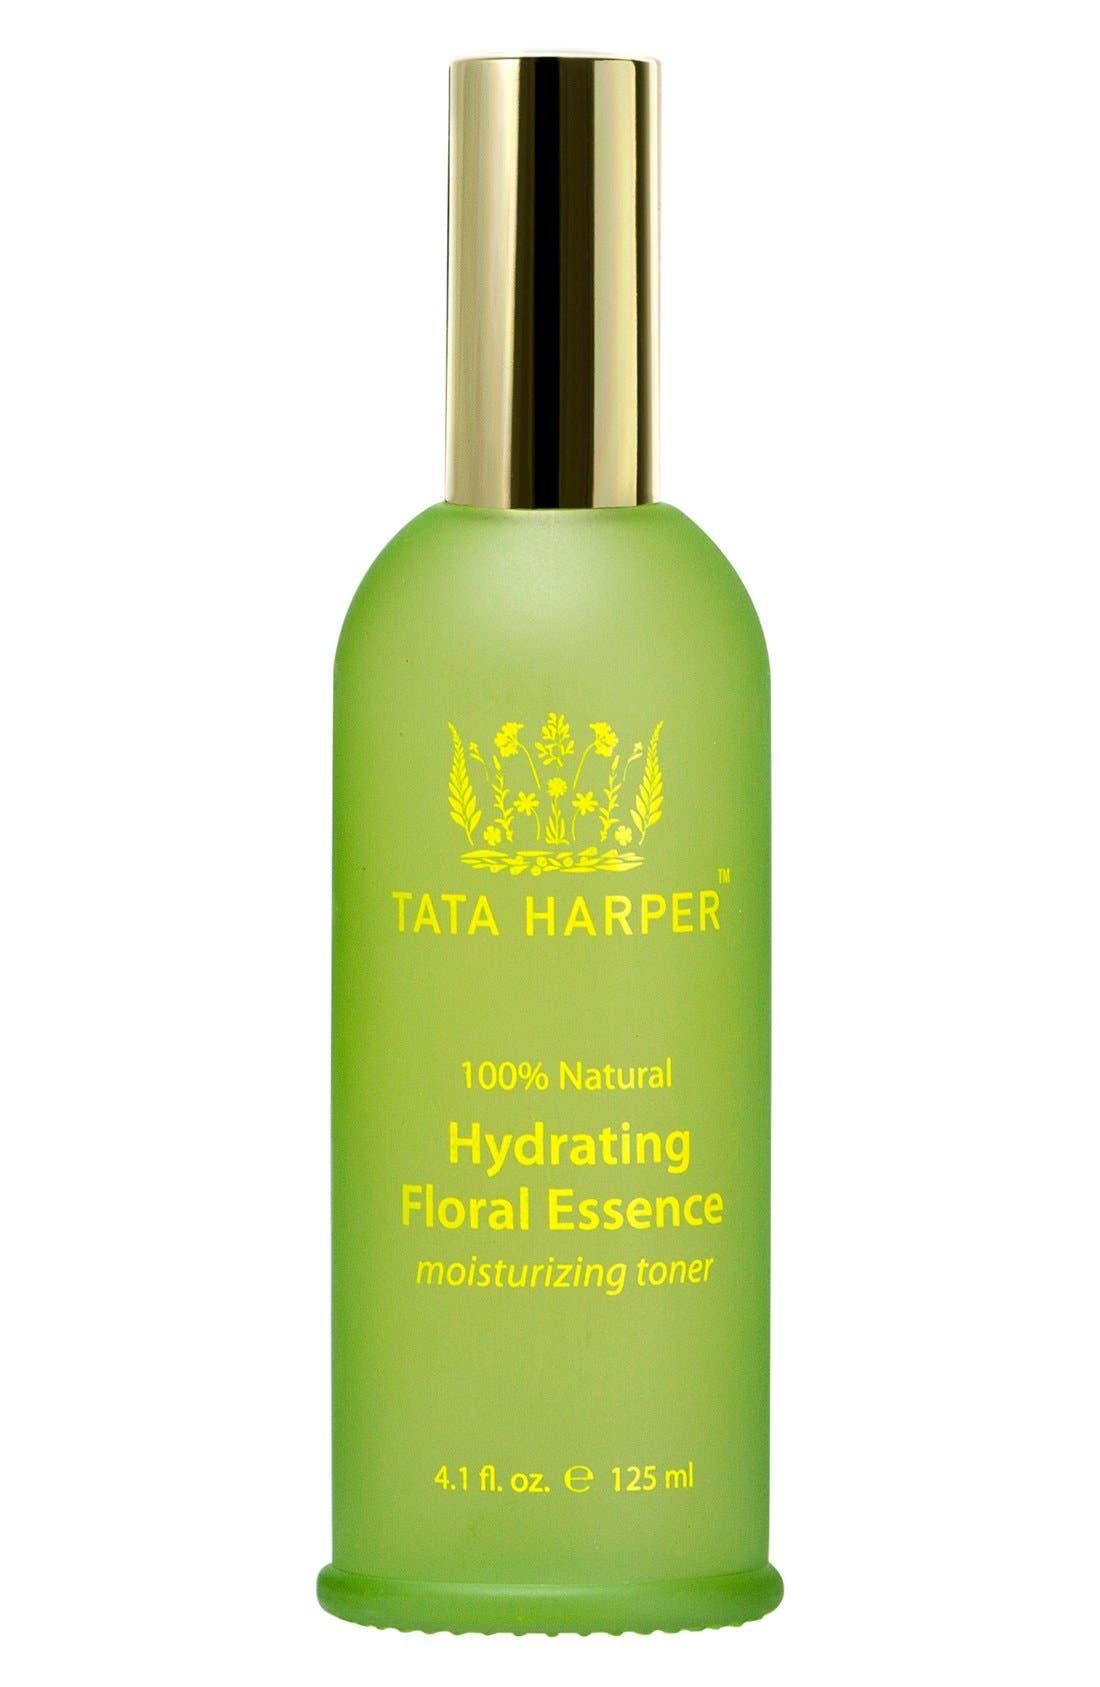 TATA HARPER SKINCARE Hydrating Floral Essence, Main, color, NO COLOR